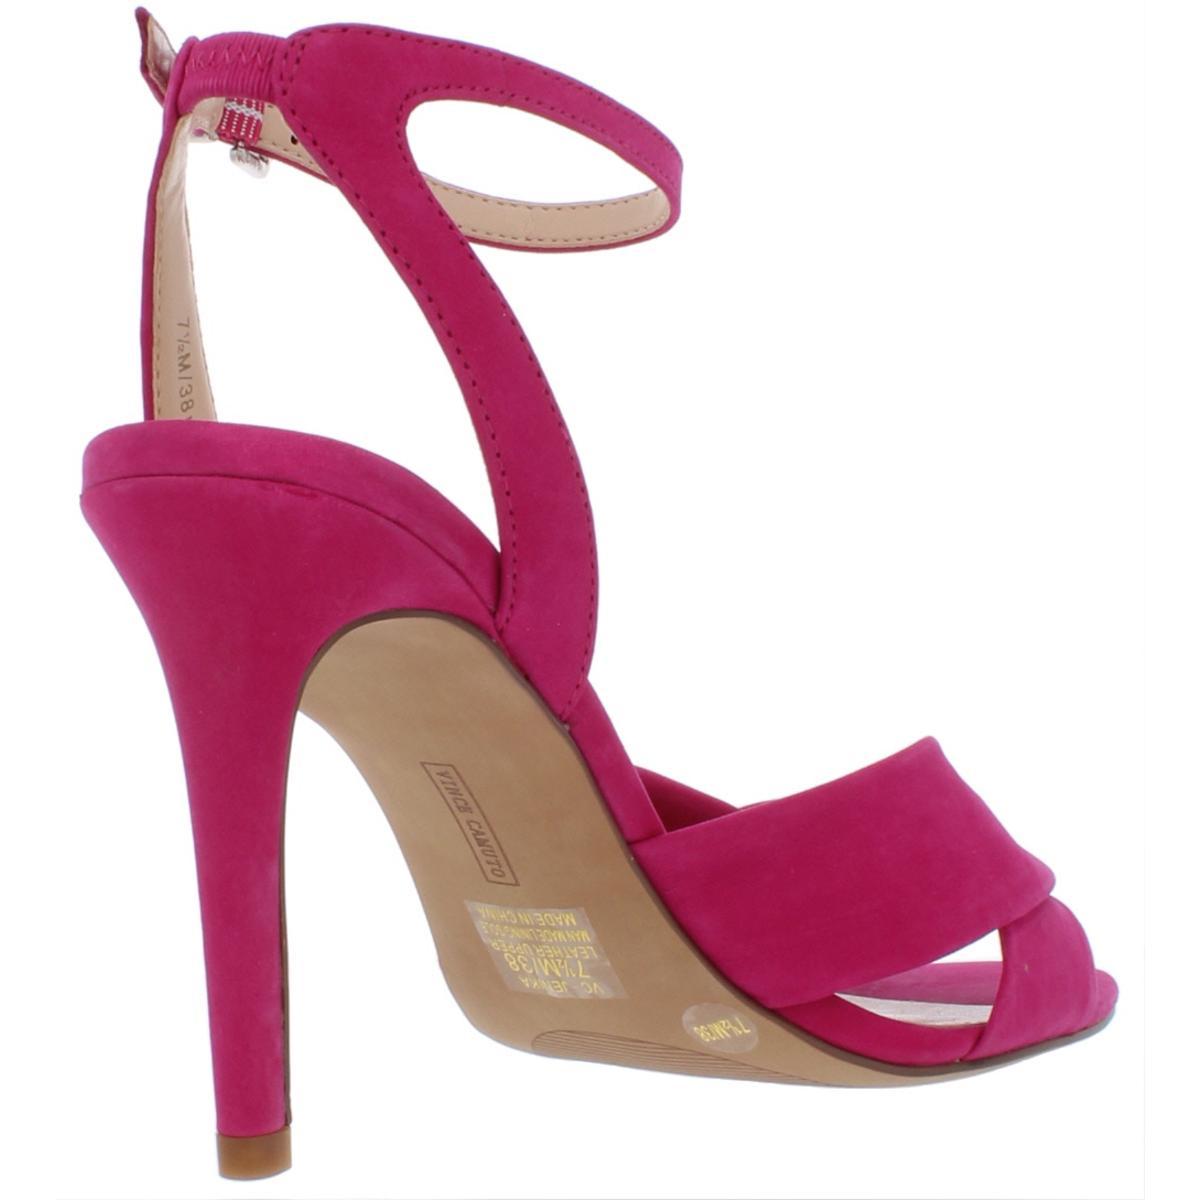 Vince-Camuto-Womens-Jenika-Nubuck-Stiletto-Night-Out-Heels-Shoes-BHFO-6694 thumbnail 8